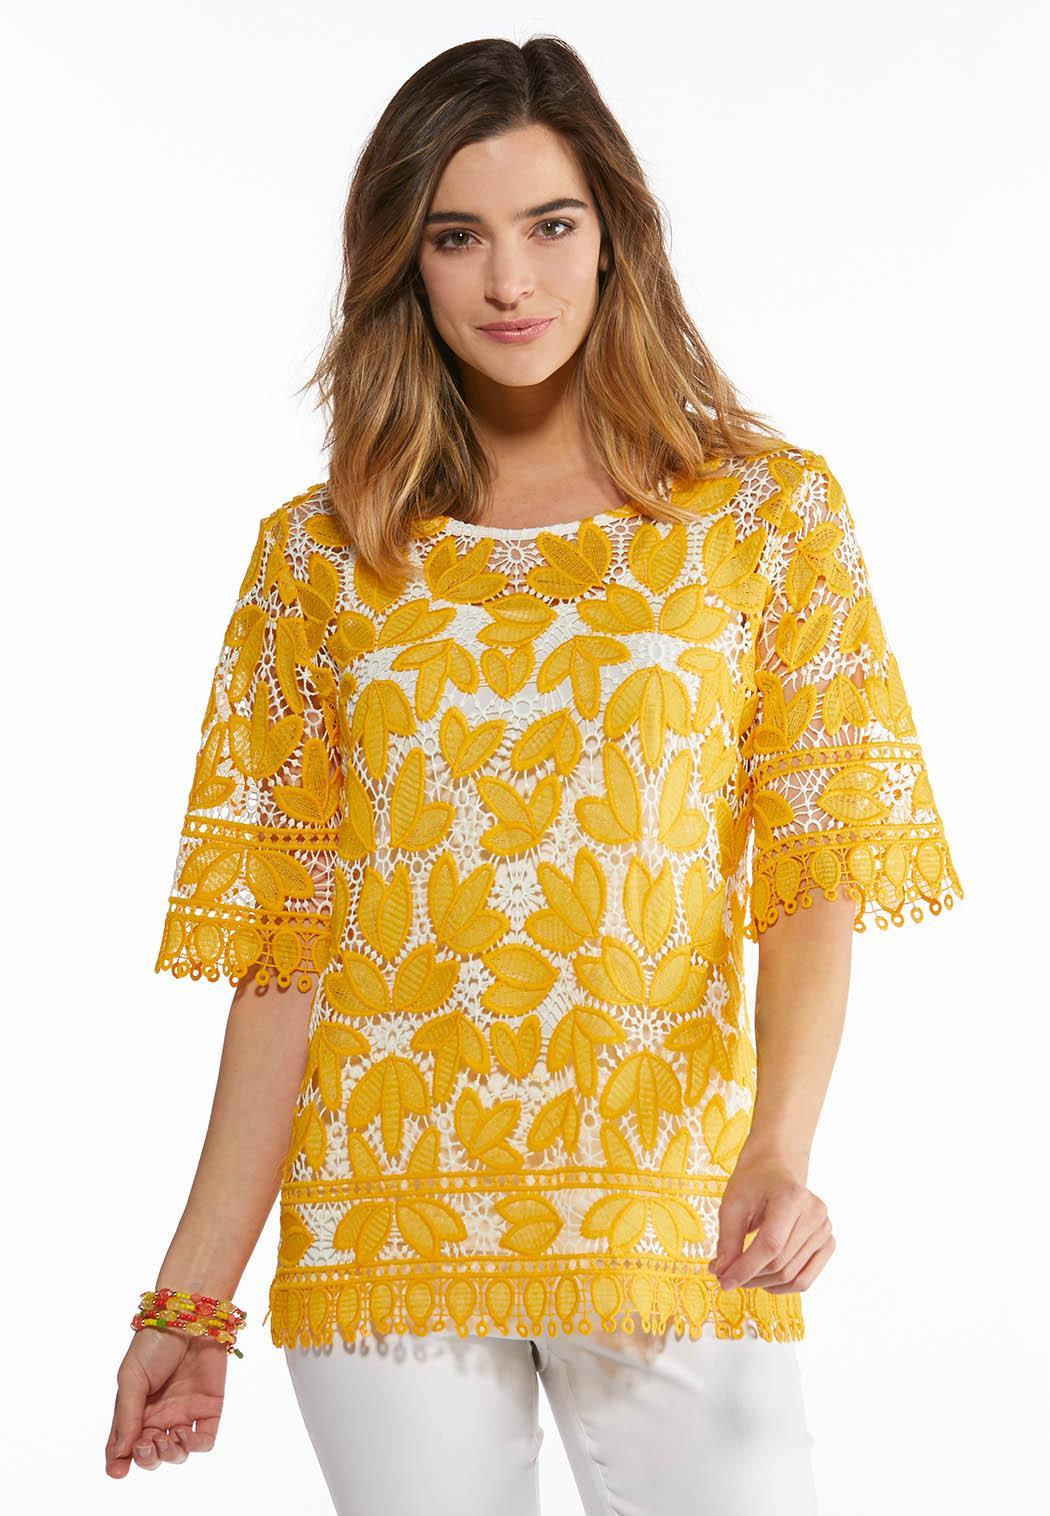 e70e0bff212826 Gold Leaf Crochet Top alternate view · Gold Leaf Crochet Top